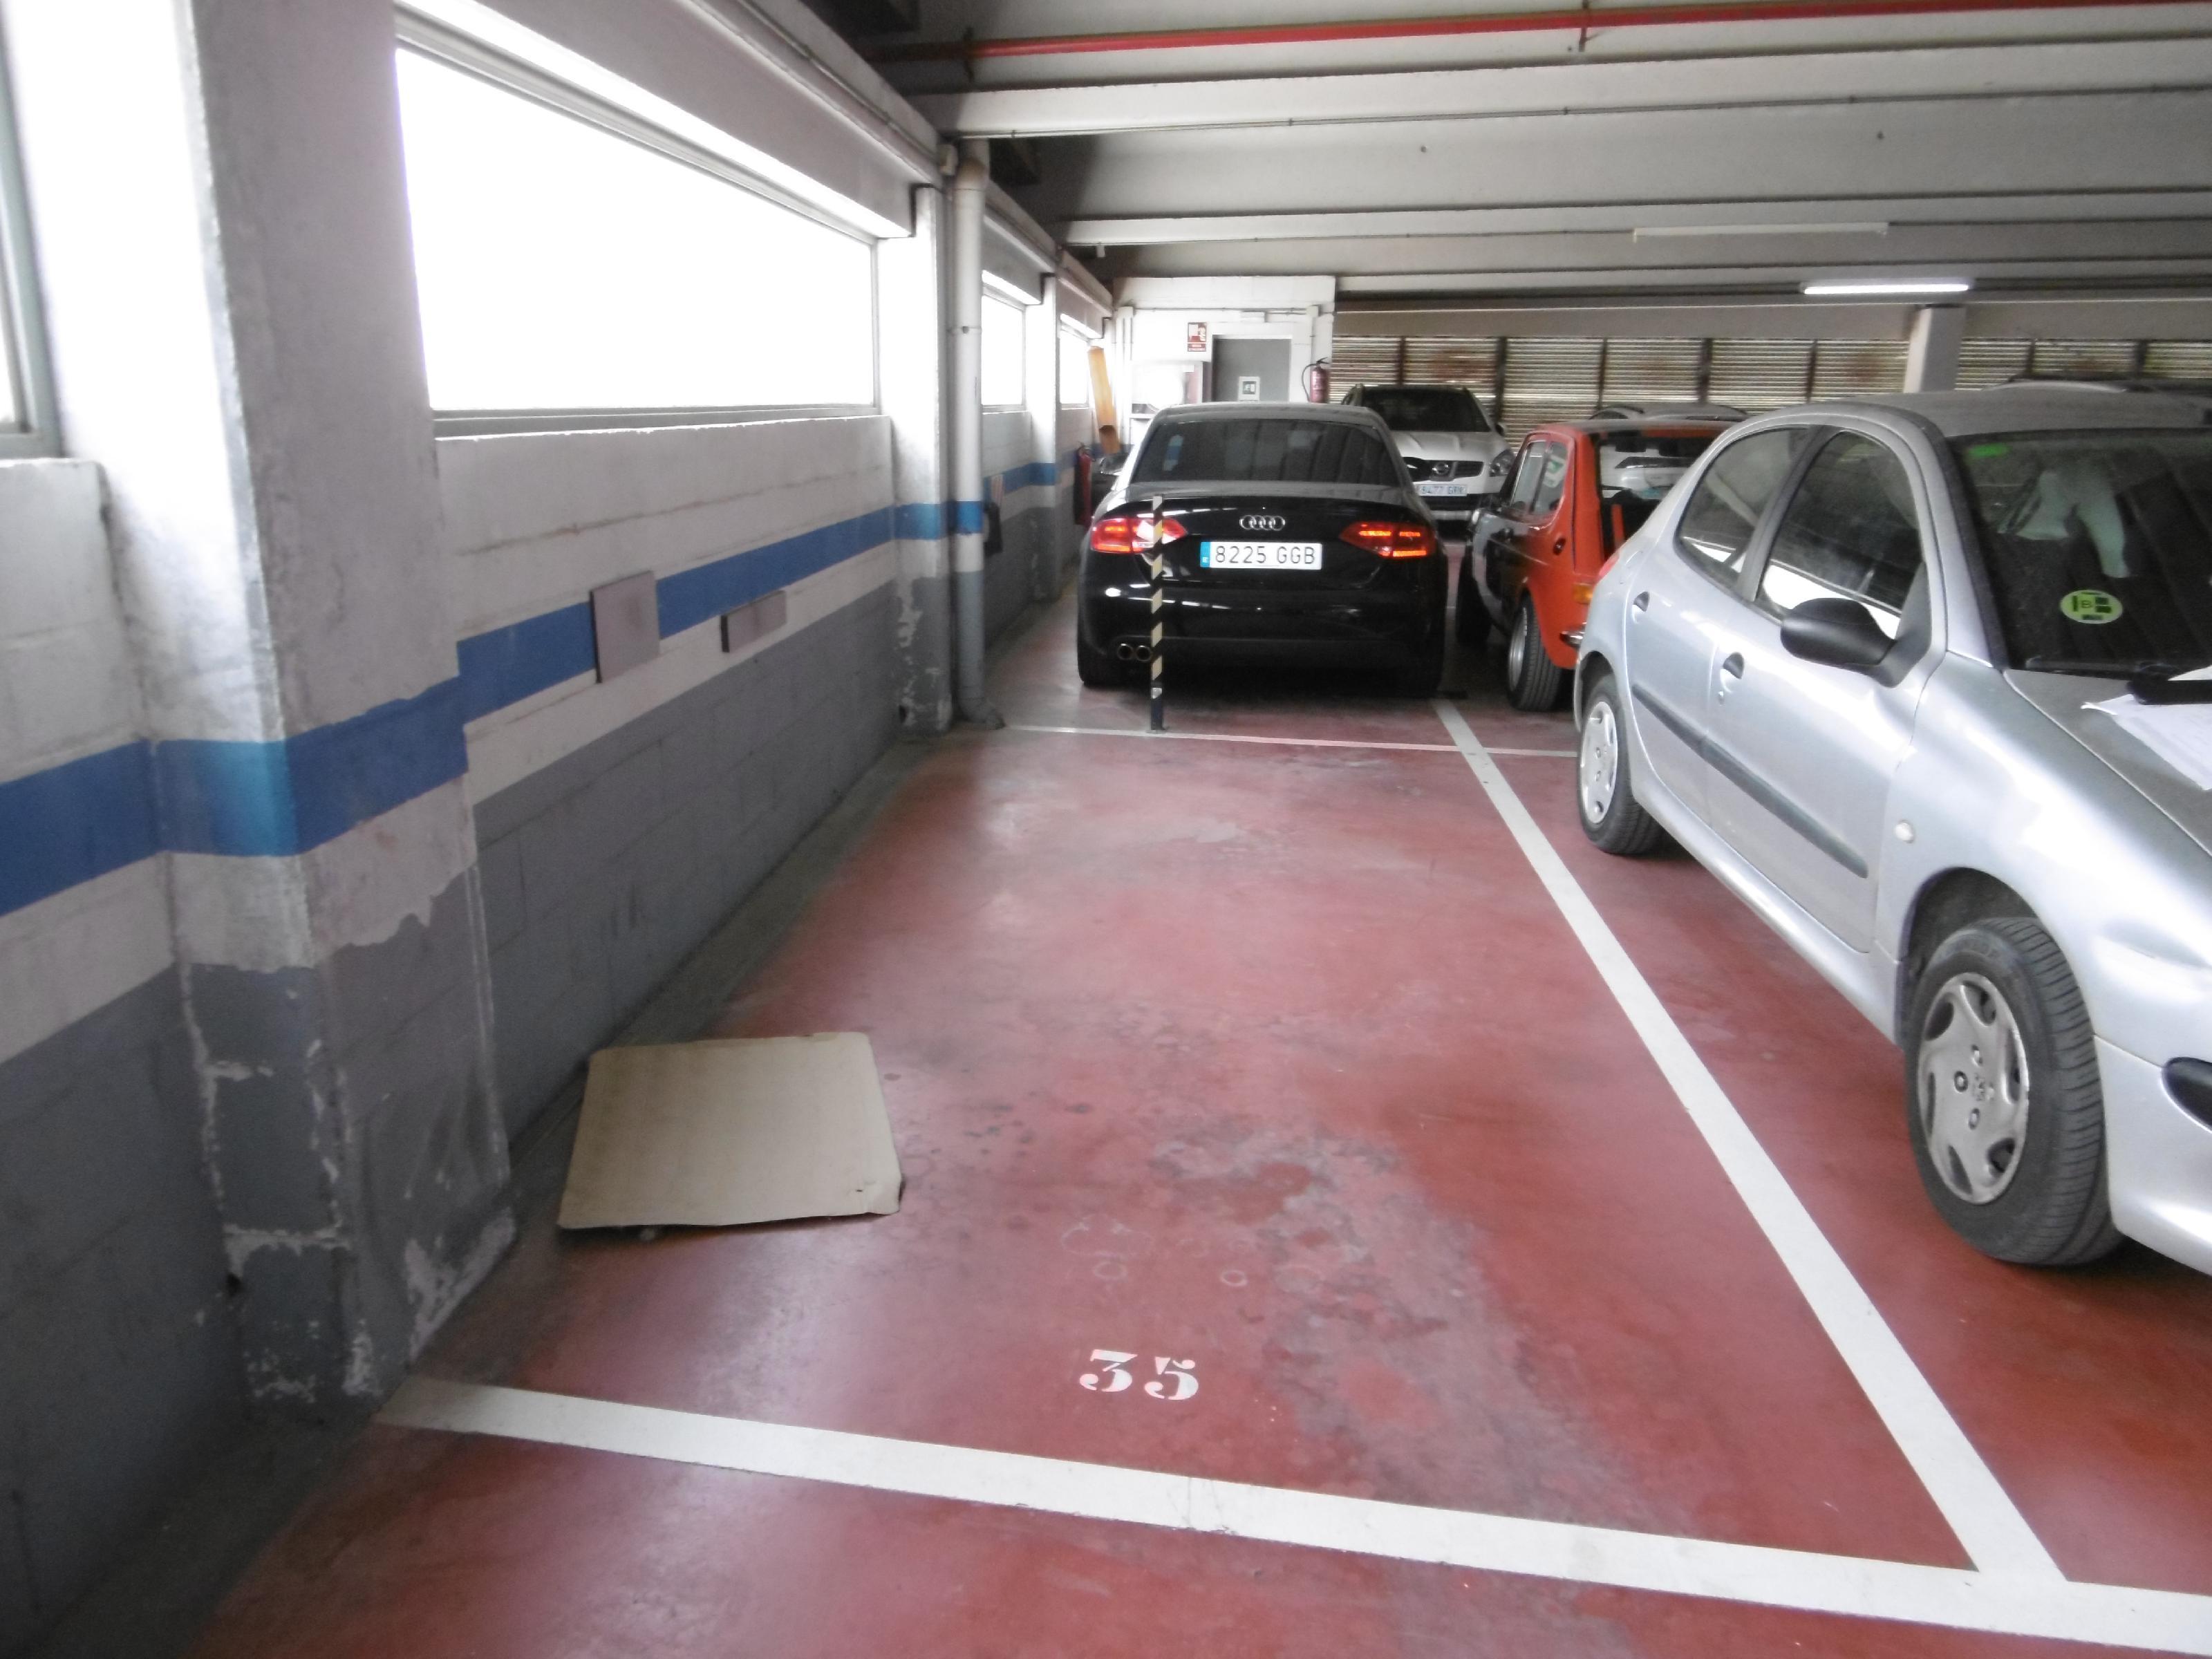 Imagen 3 Parking Coche en venta en Sant Feliu De Llobregat / Próximo a  la escuela Monmany S. Feliu